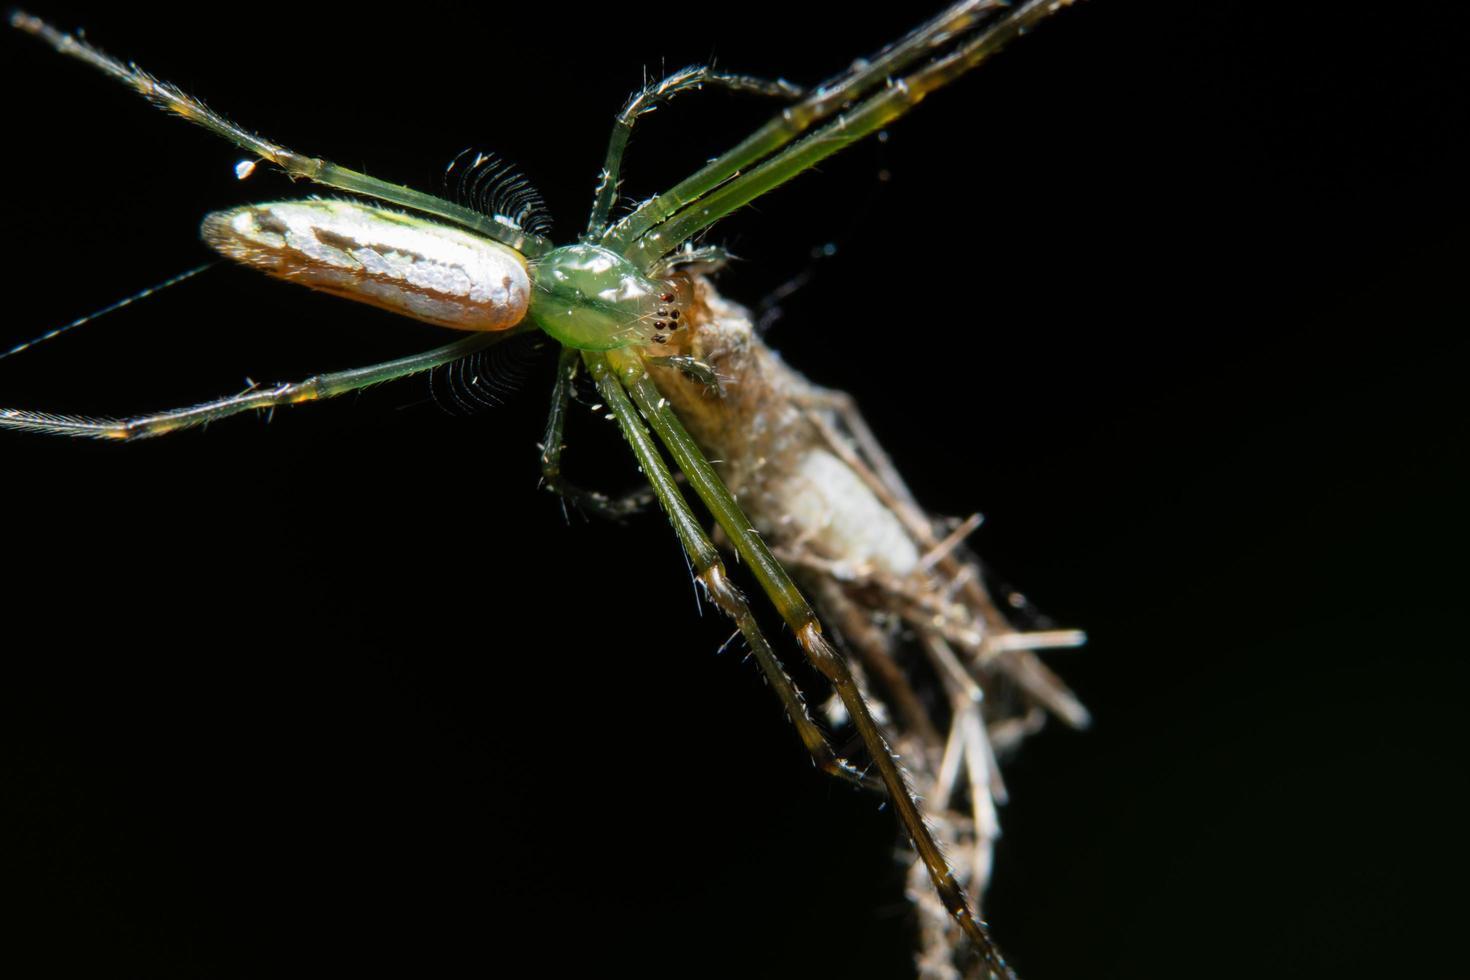 araignée macro sur feuille photo